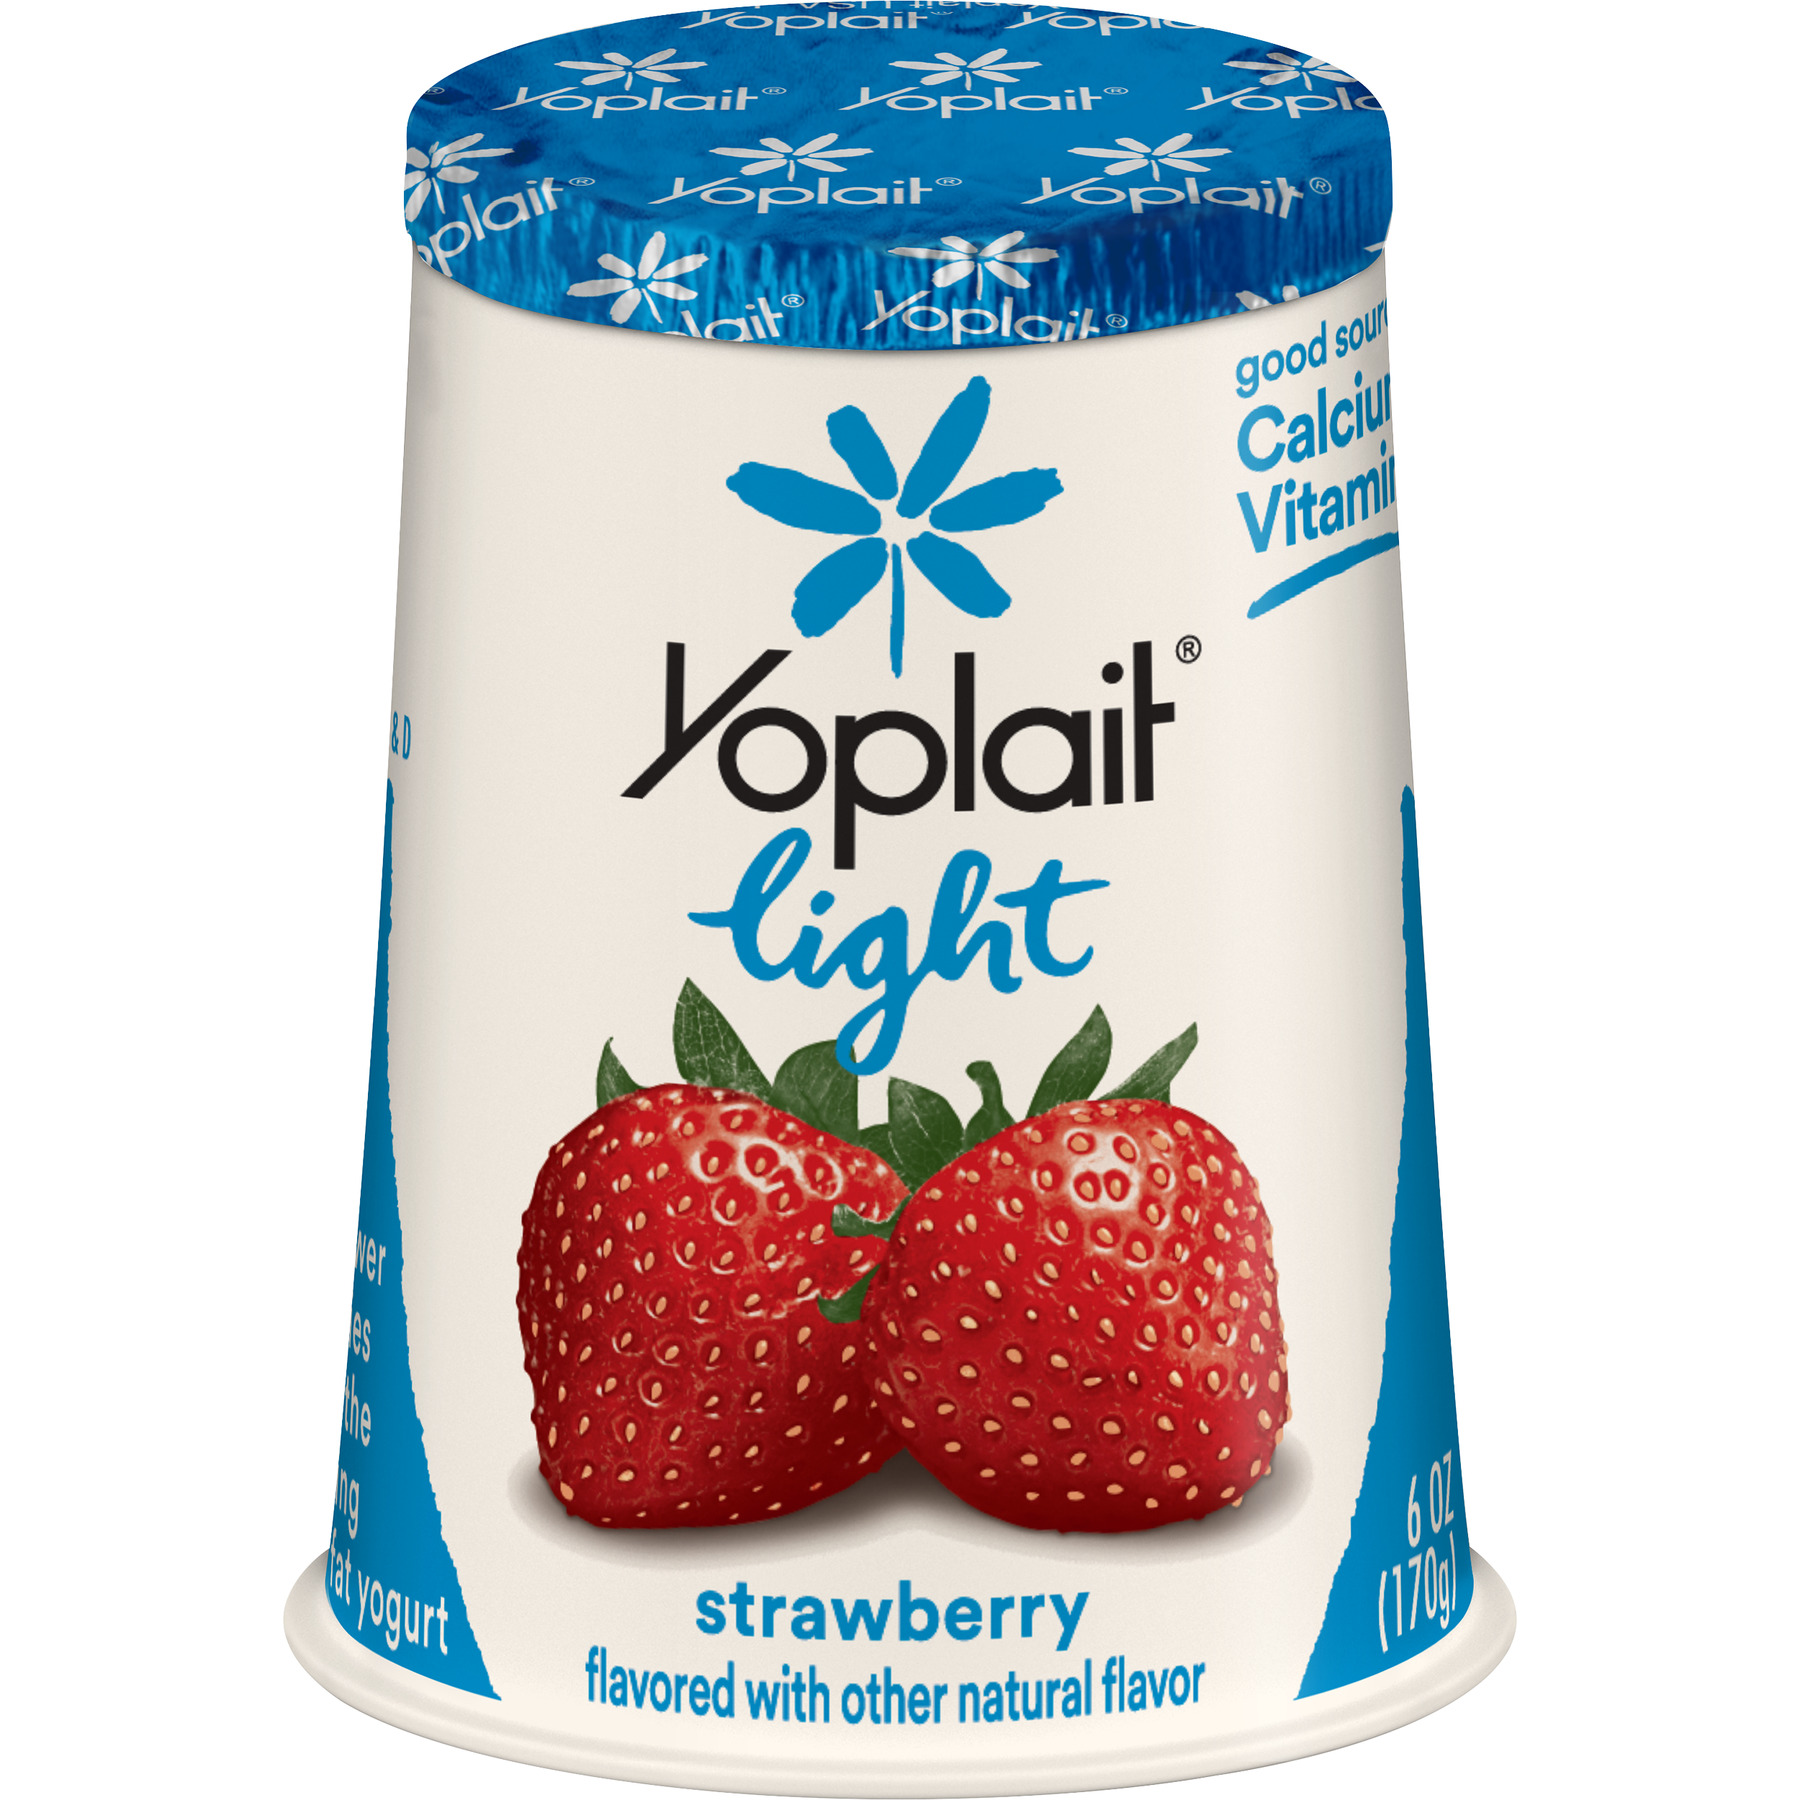 Yoplait Light Strawberry Fat-Free